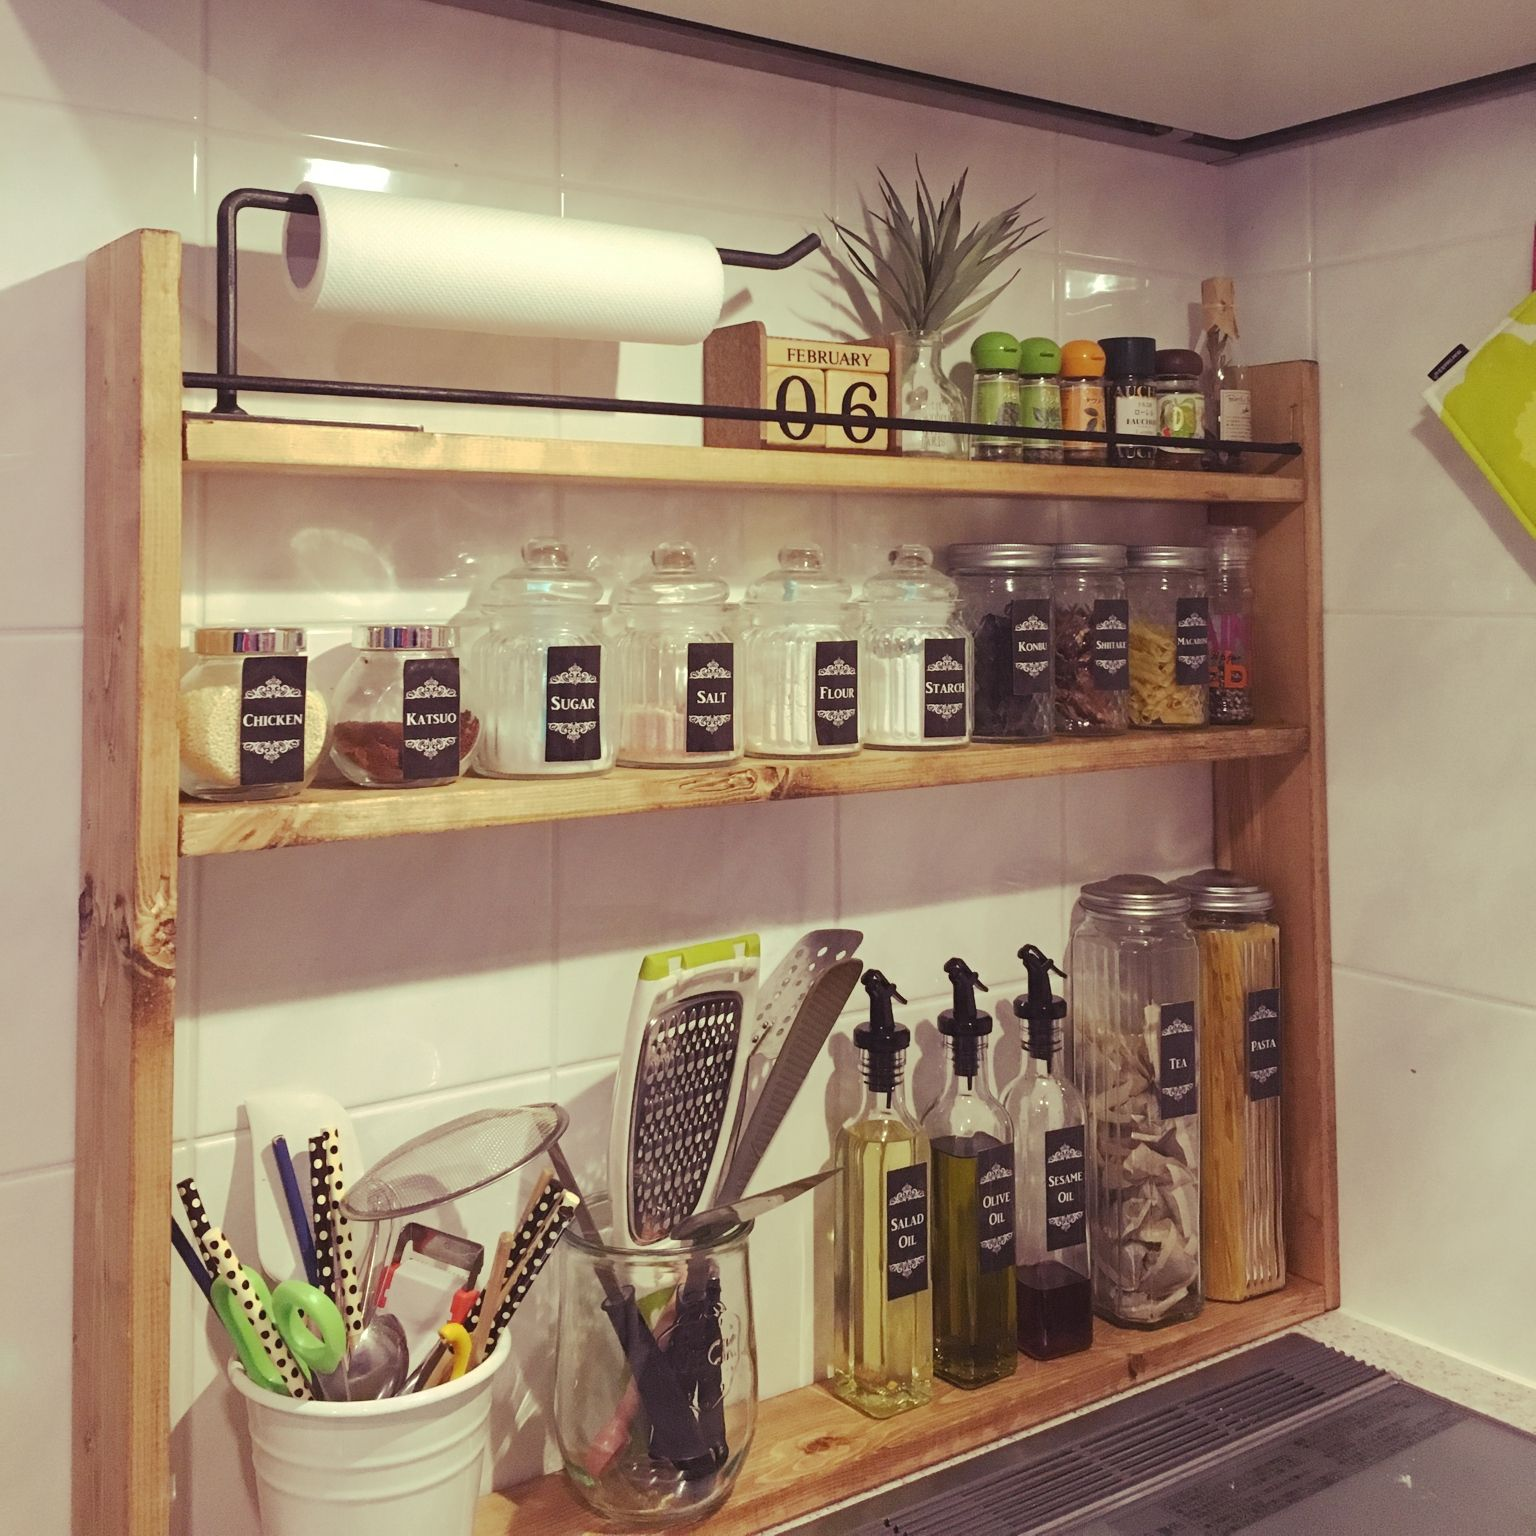 Diy 棚 調味料 の画像検索結果 インテリア 収納 キッチンアイデア